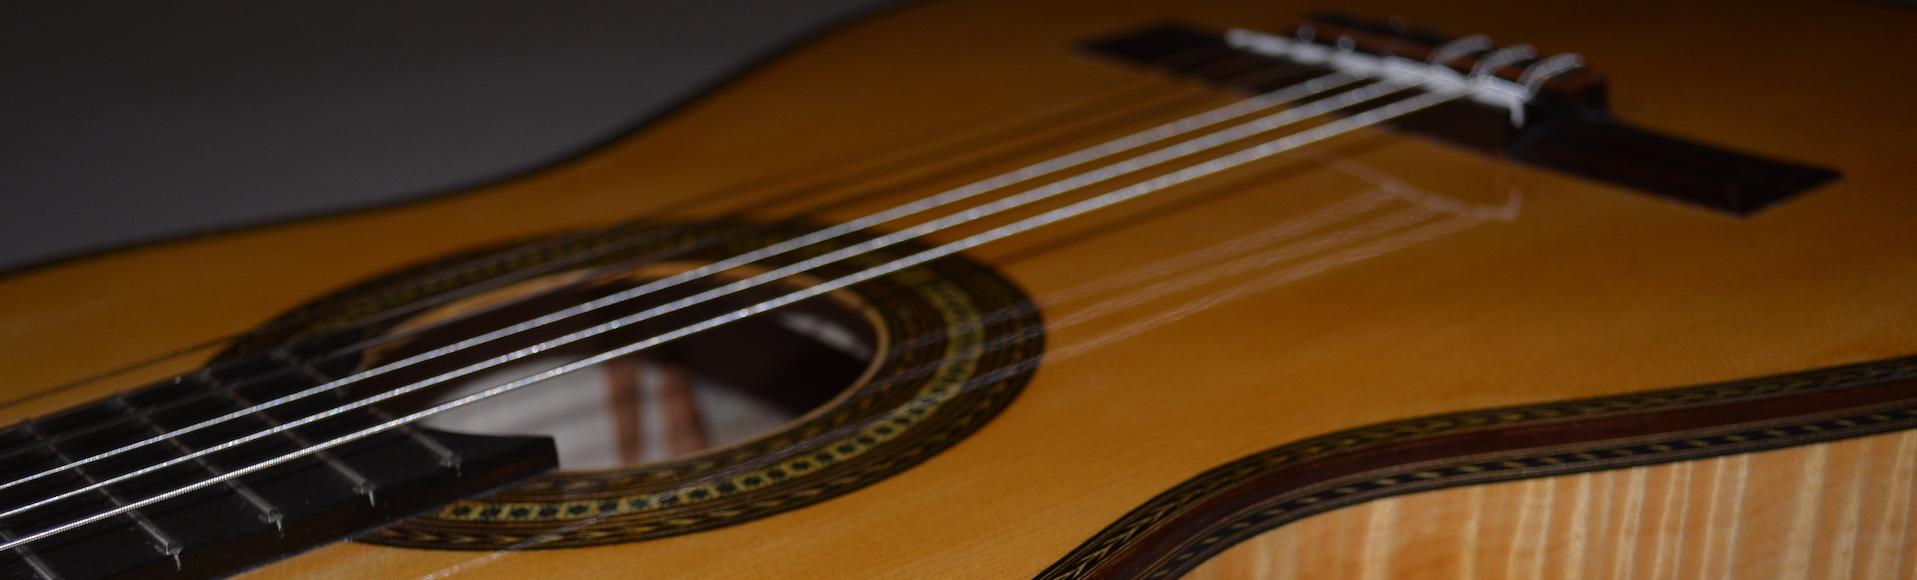 OGS Guitar Orchestra / Orchestre de guitare SGO